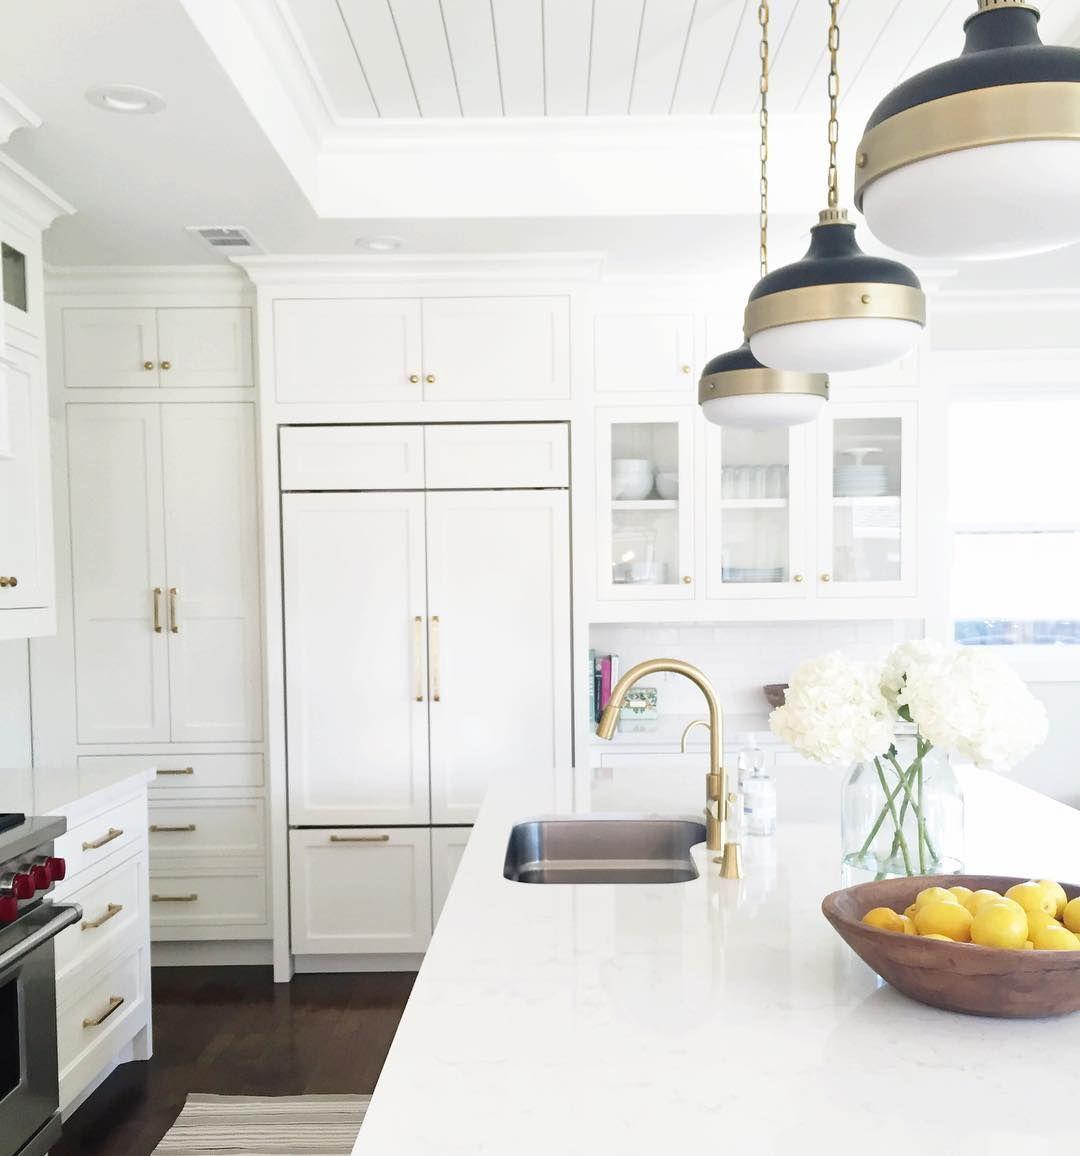 Studiomcgee full service interior design firm e design for Kitchen design utah